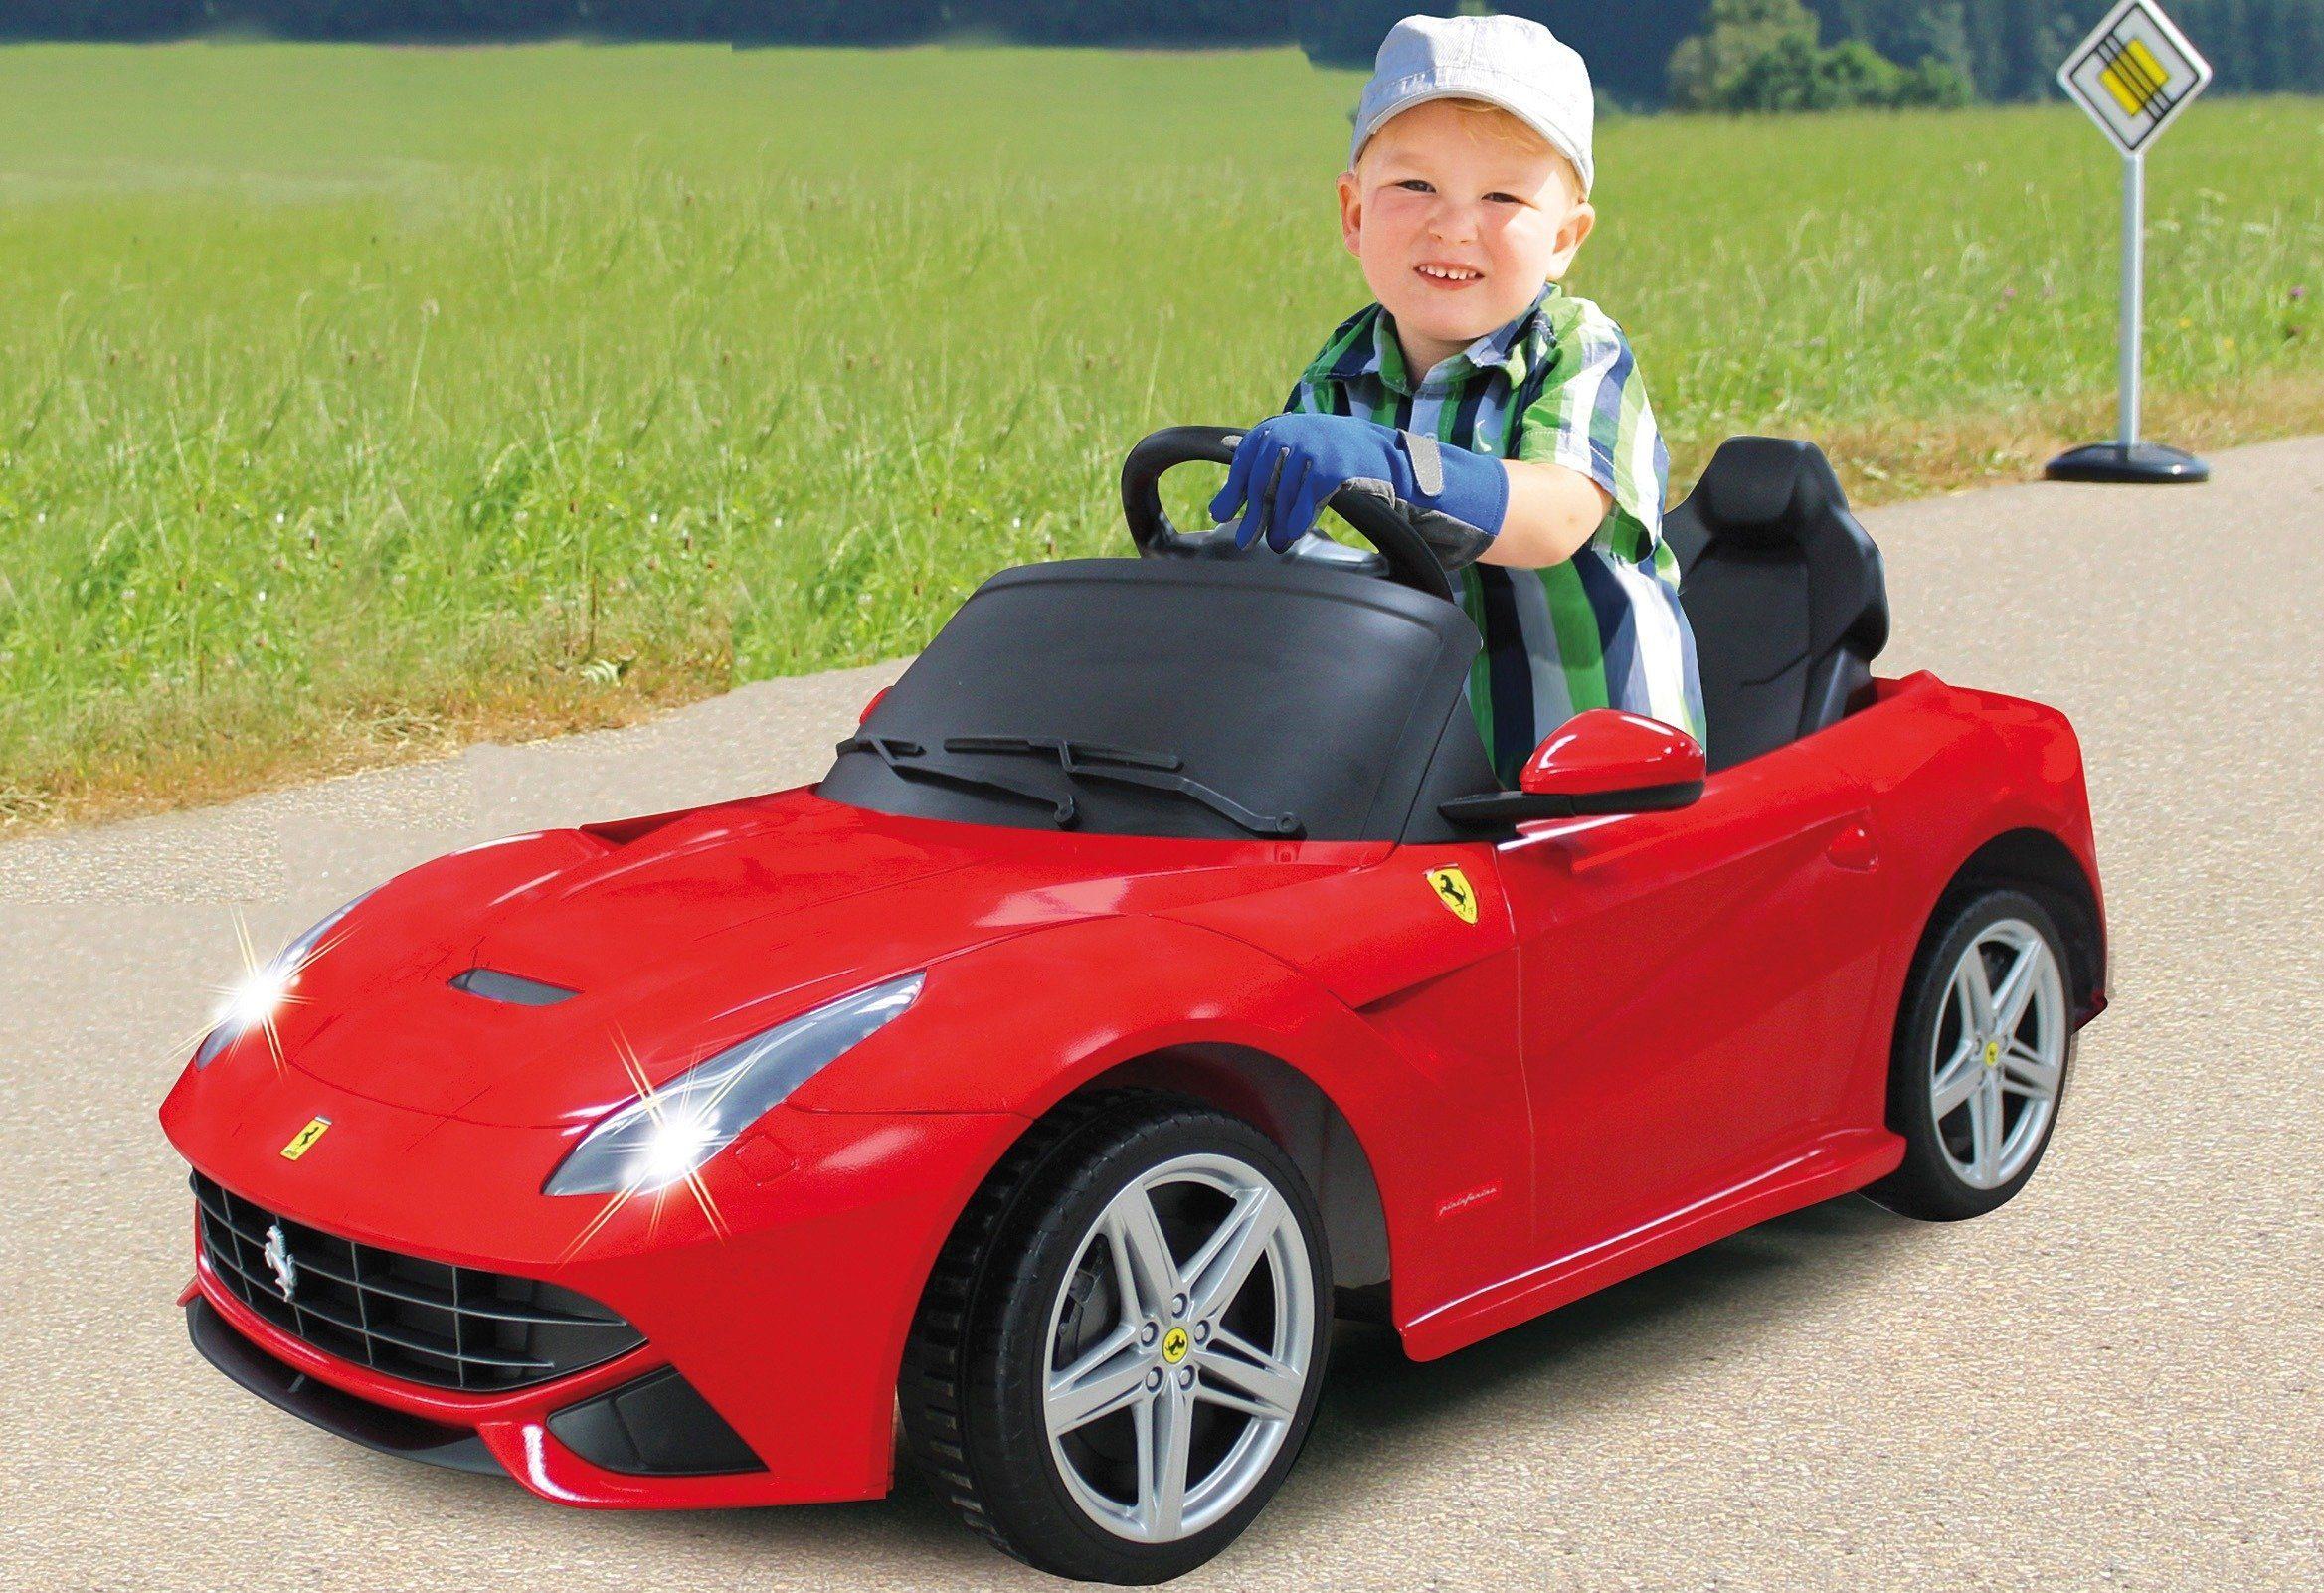 JAMARA KIDS Elektroauto »Ride-On Ferrari F12 Berlinetta«, rot, inkl. Fernsteuerung